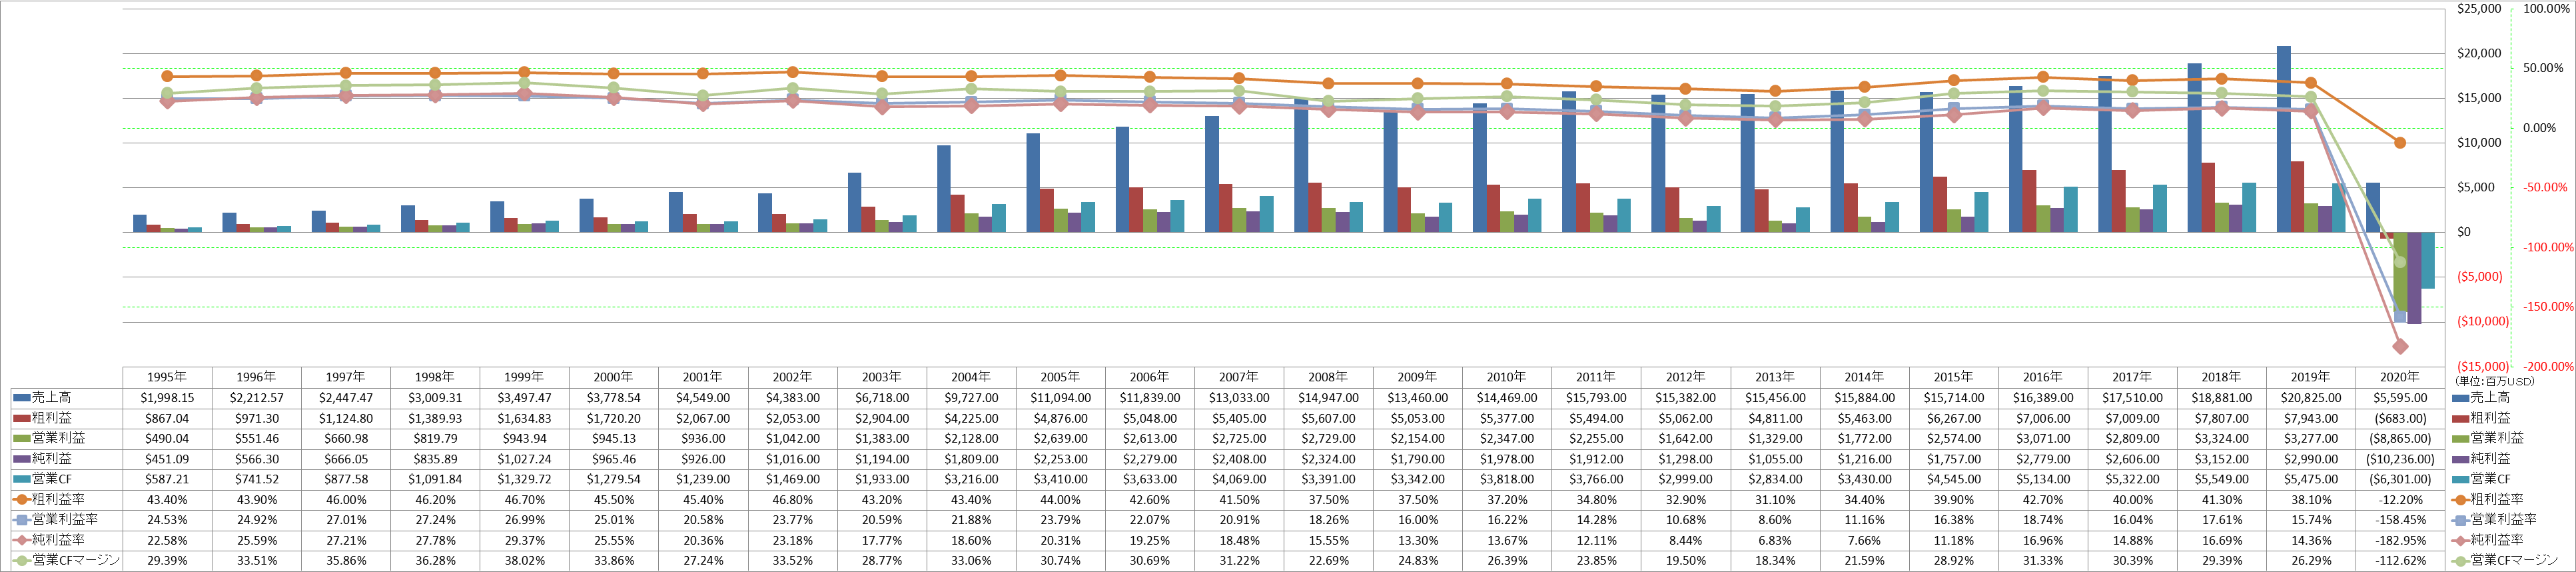 ccl-annual-profitability-1